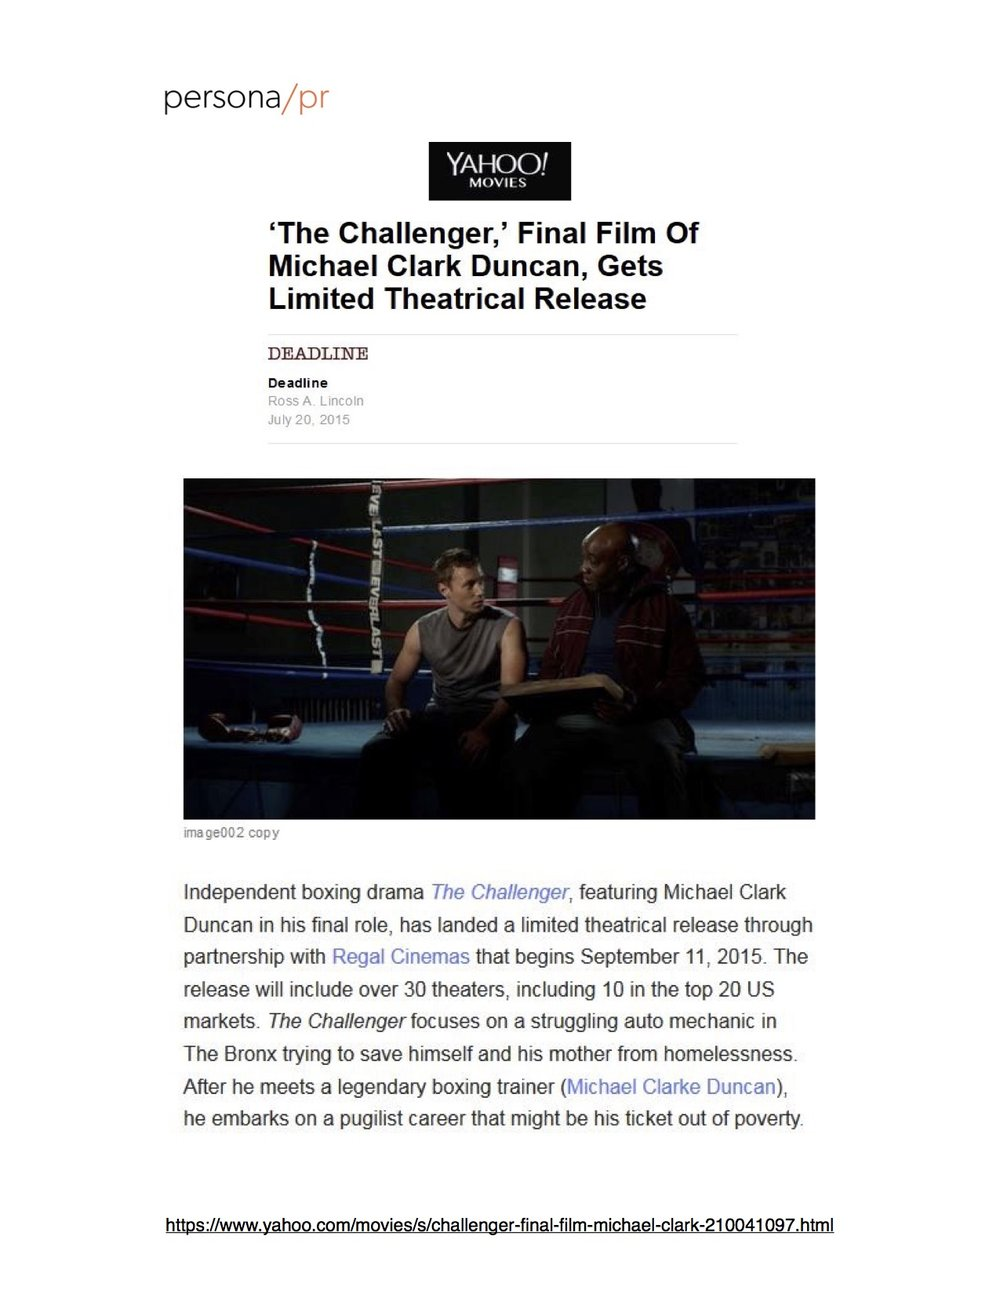 27 KentMoran-Yahoo!Movies-7.20.15.jpg